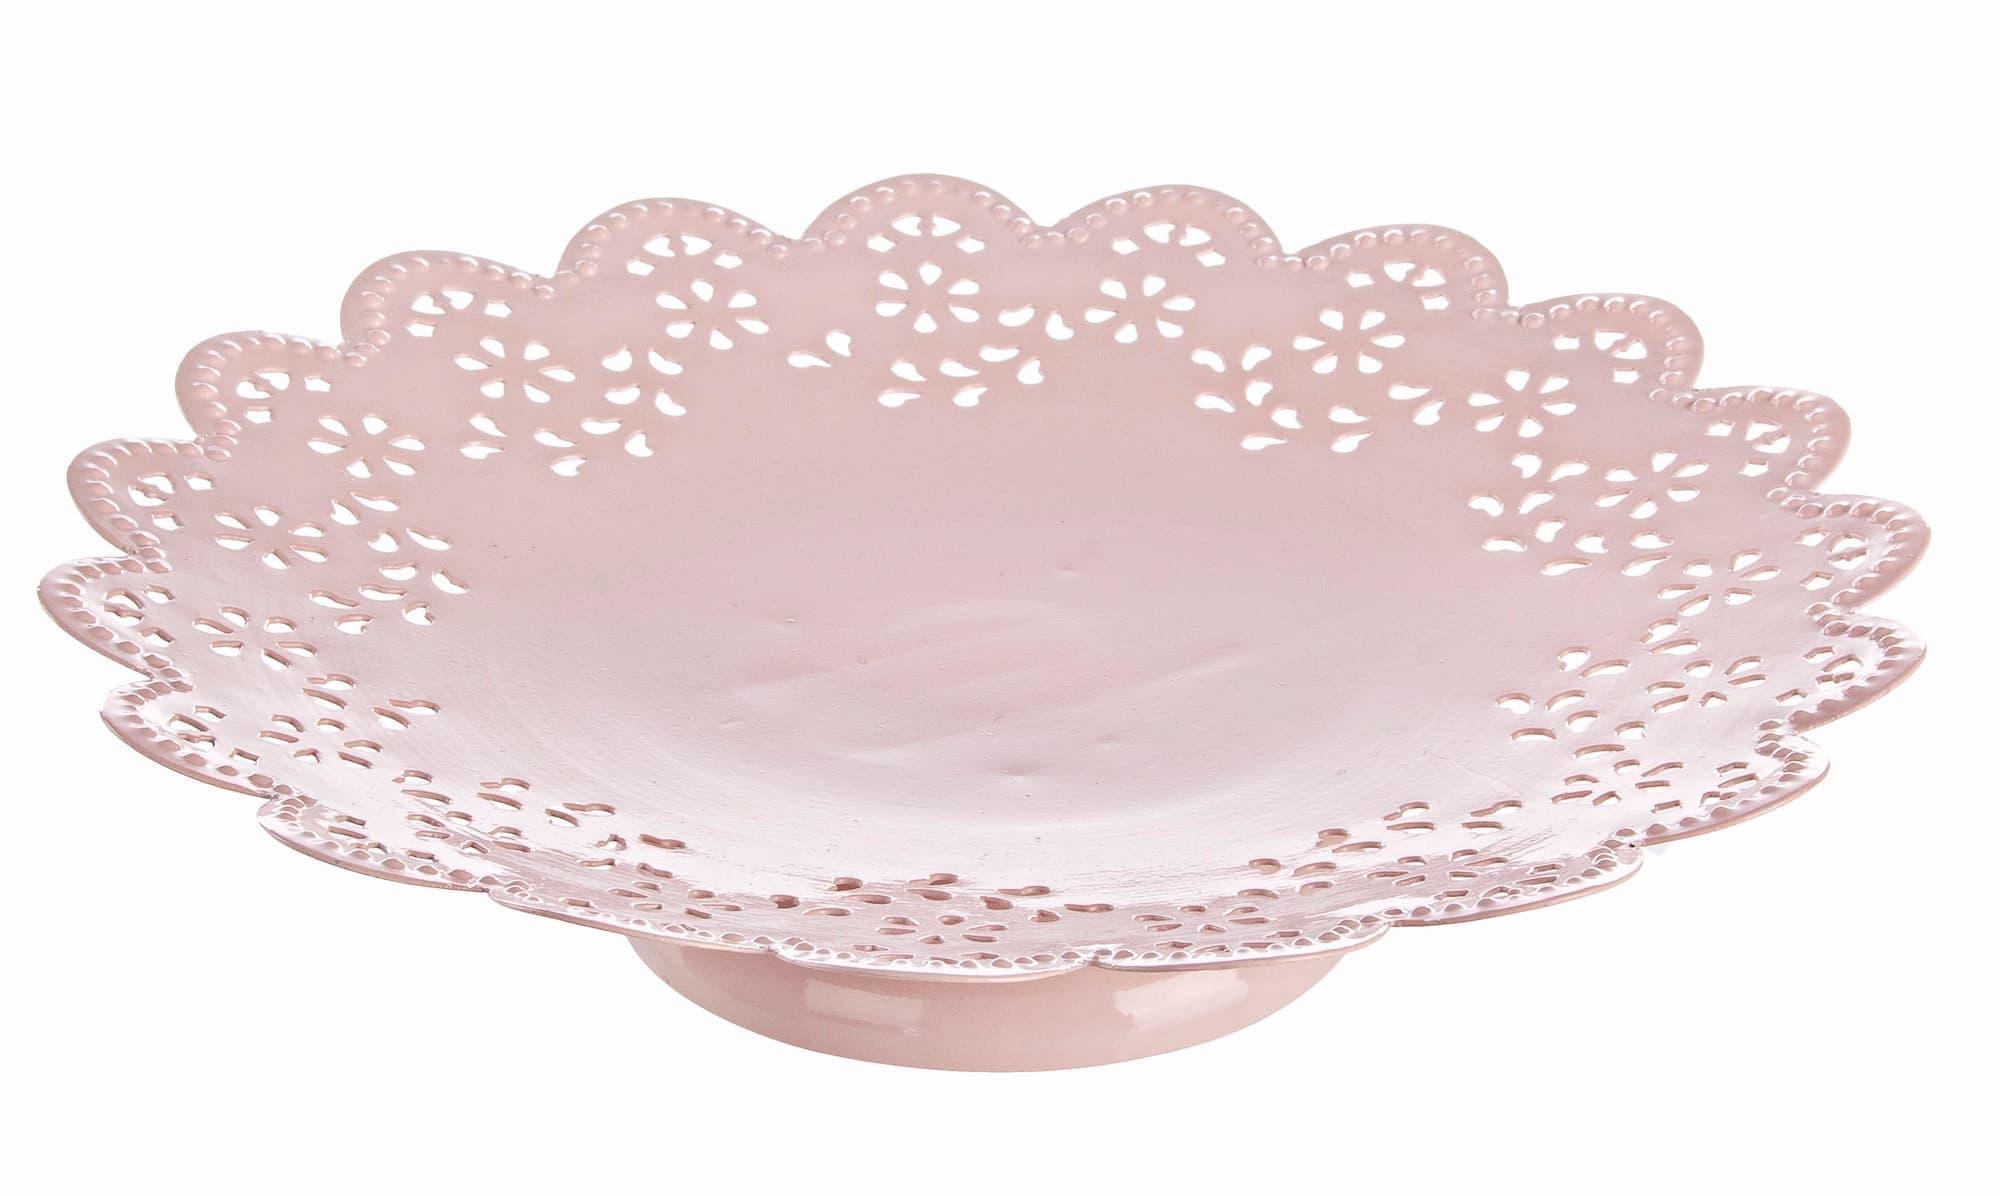 Platou decorativ metalic Finesse Roz deschis, Ø25xH5 cm poza